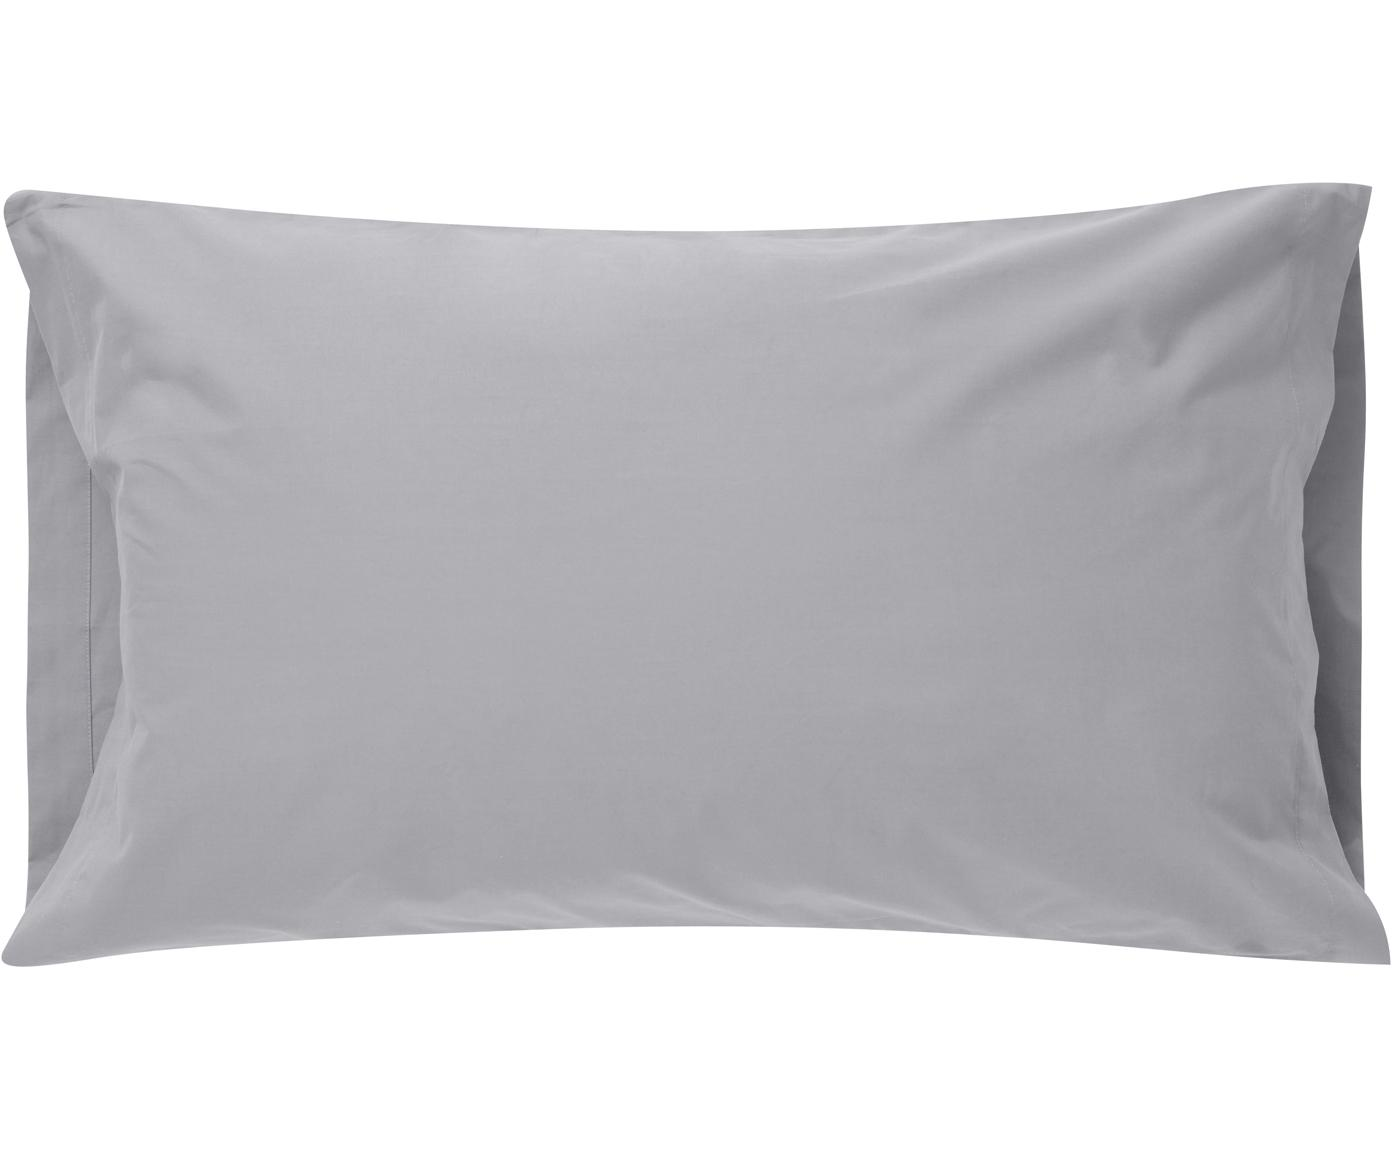 Funda de almohada Plain Dye, Algodón, Gris, An 50 x L 110 cm